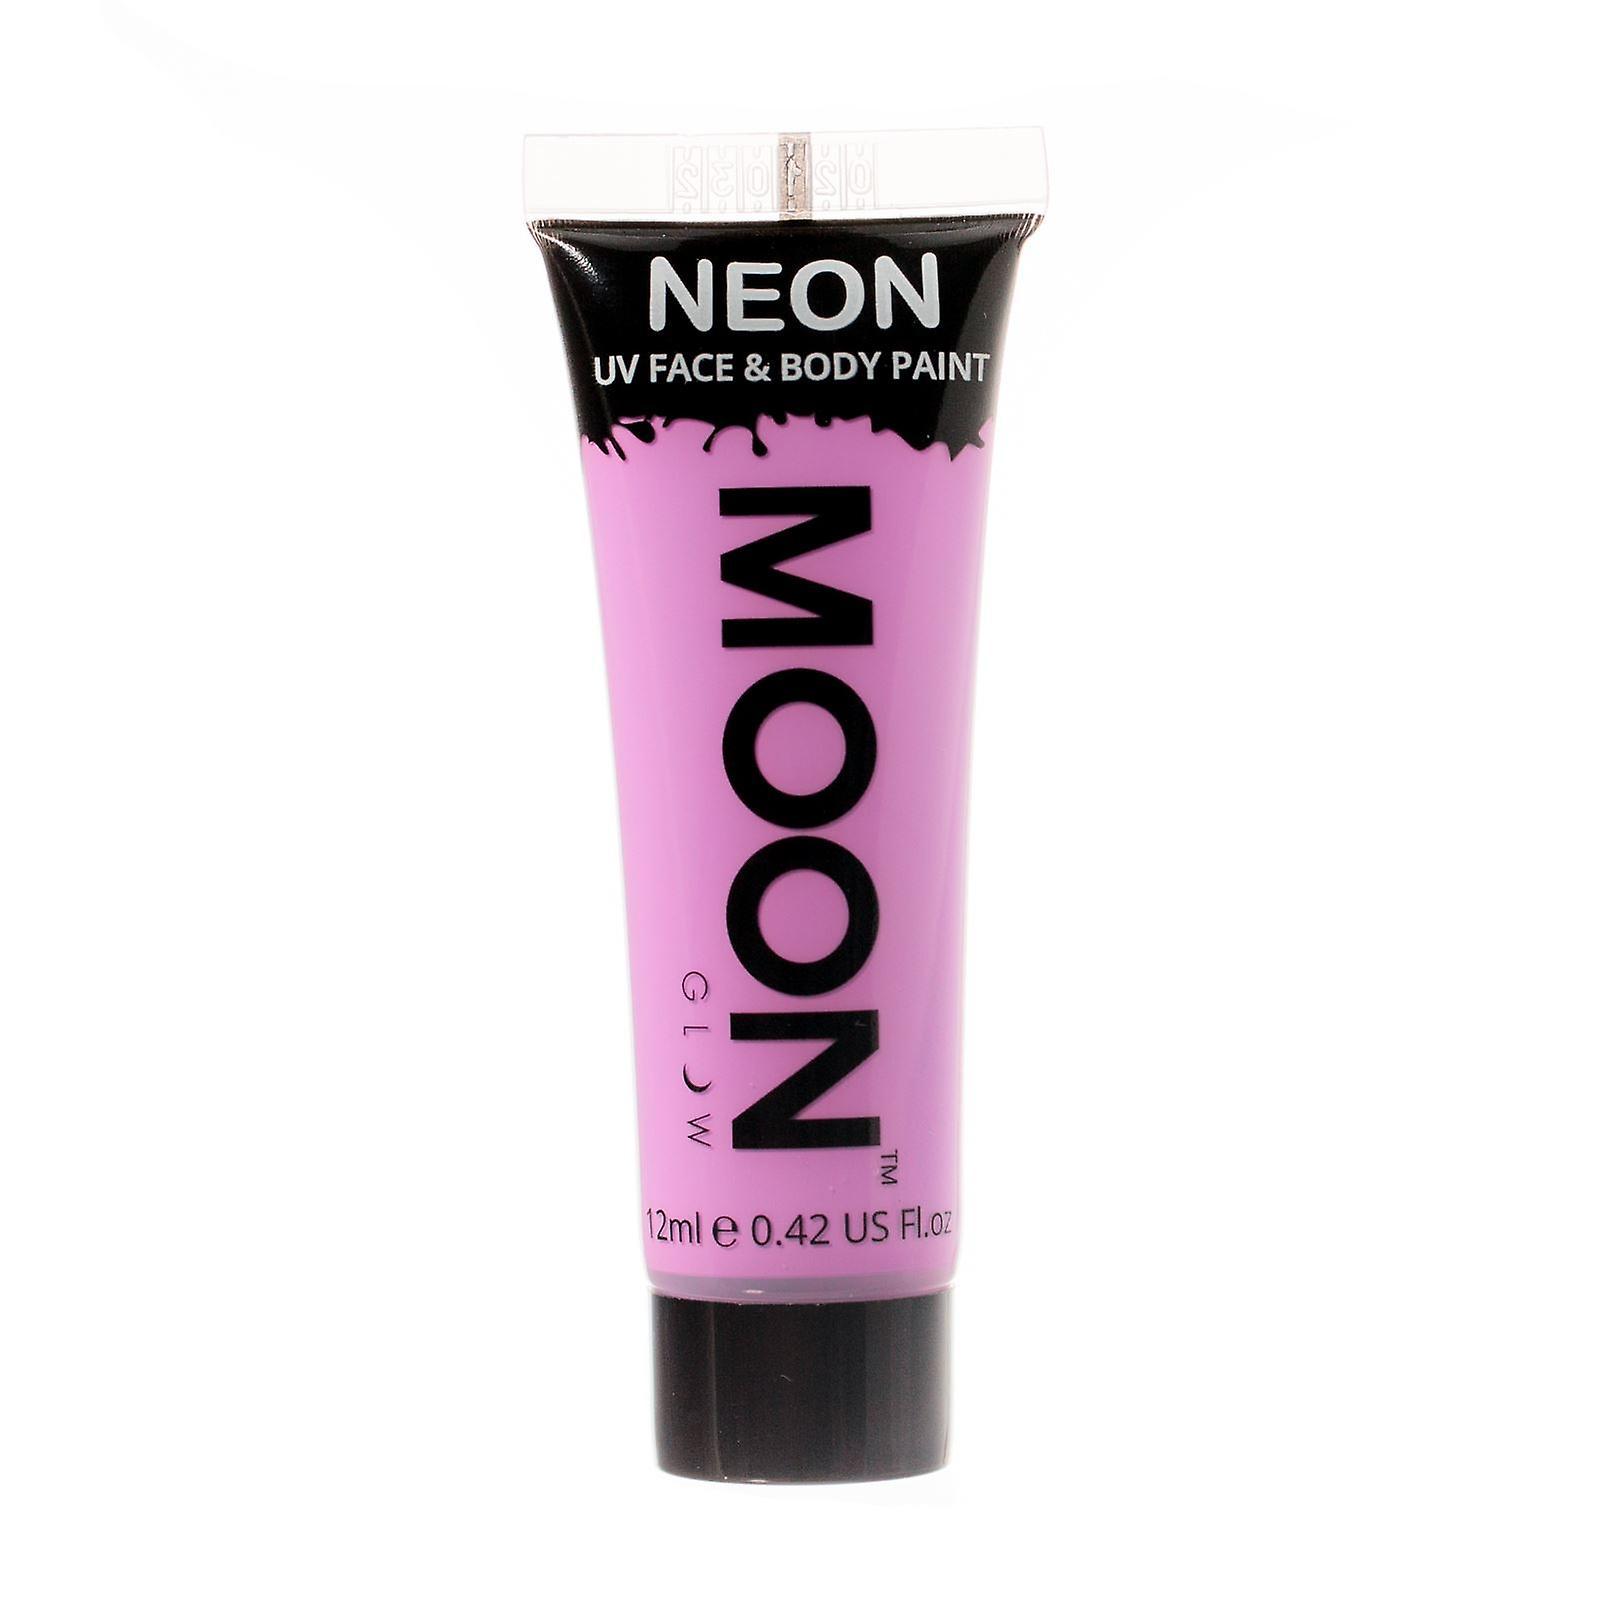 Moon Glow - 12ml Neon UV Face & Body Paint - Pastel Lilac